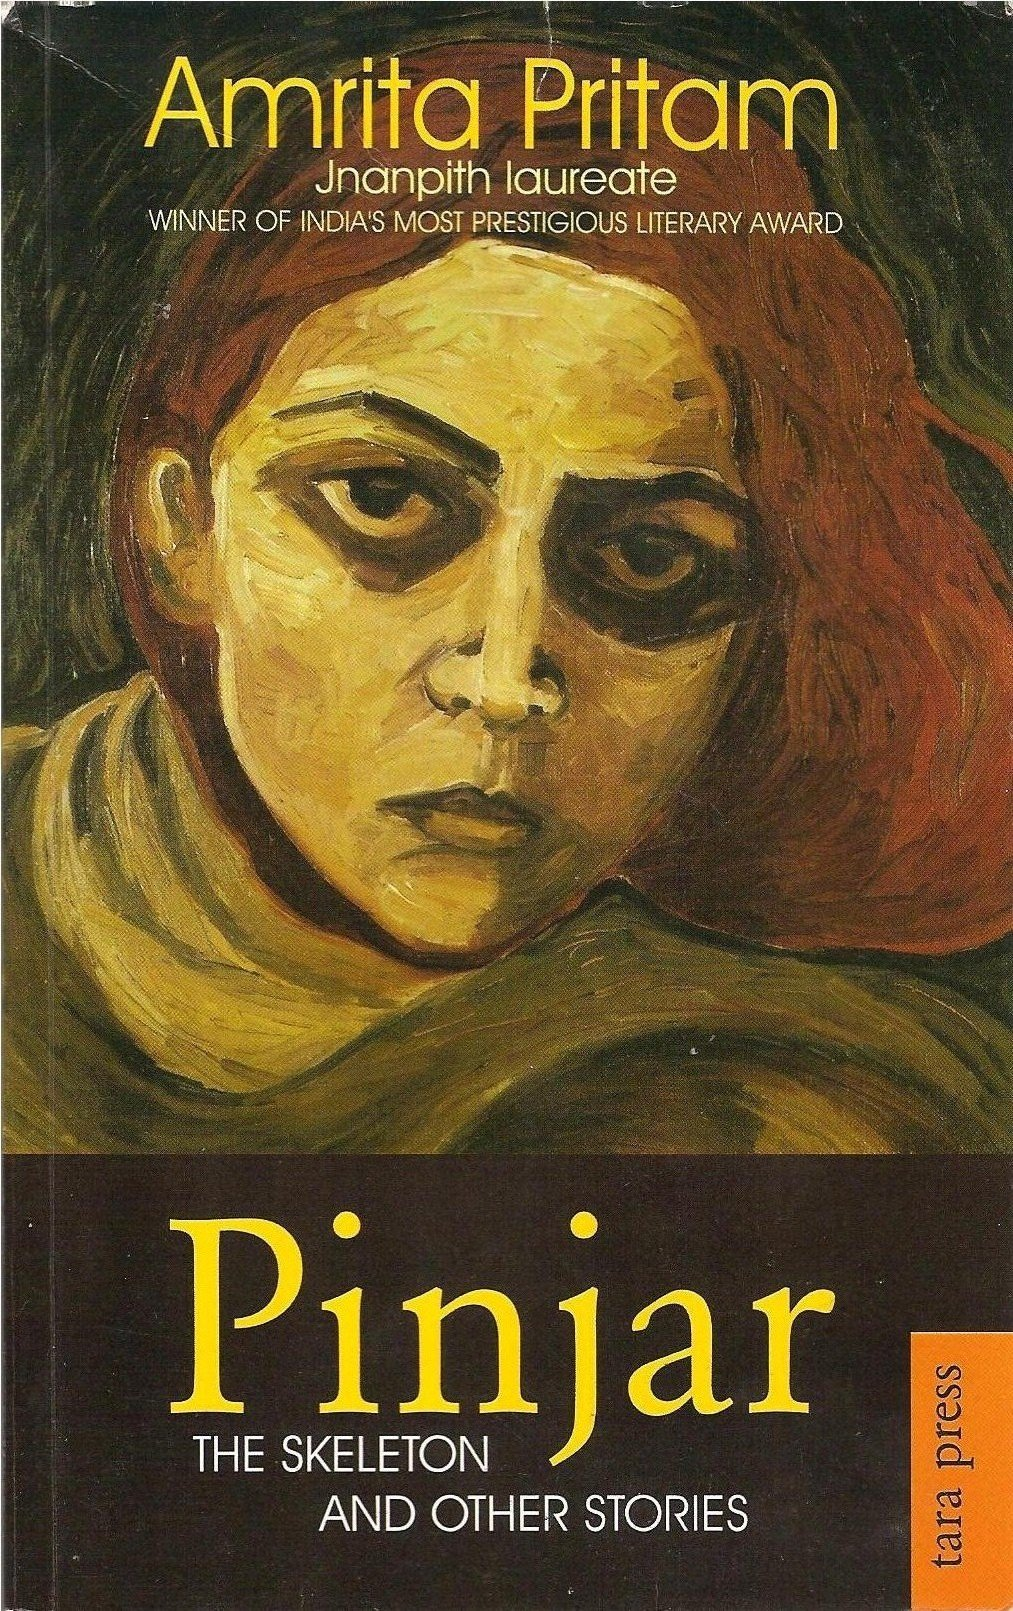 Pinjar by Amrita Pritam